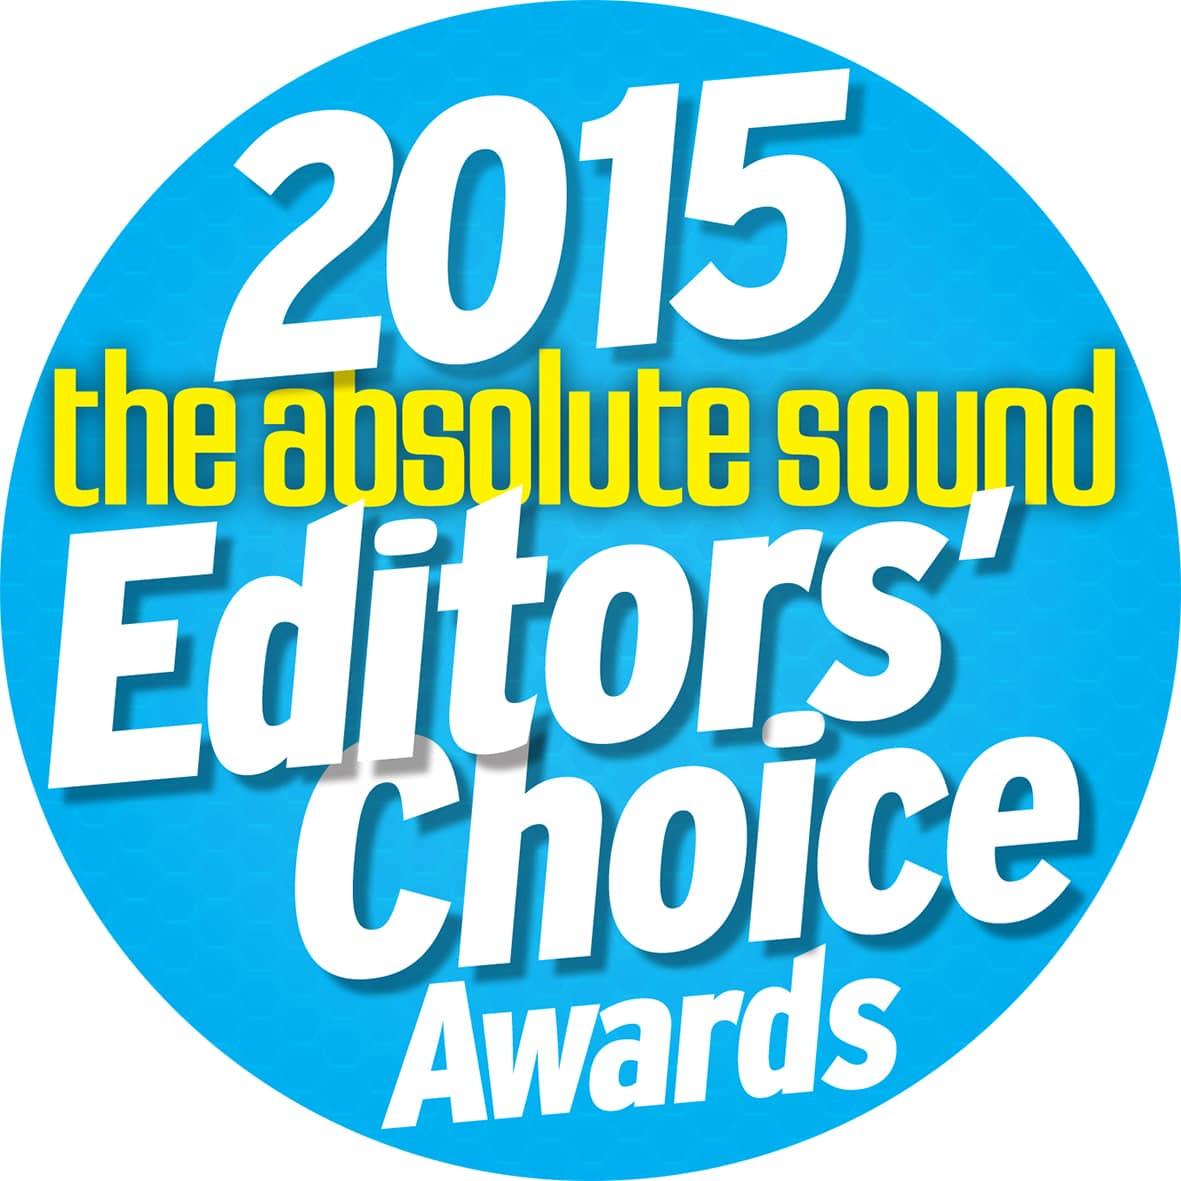 Editors choice award 2015 for S-15